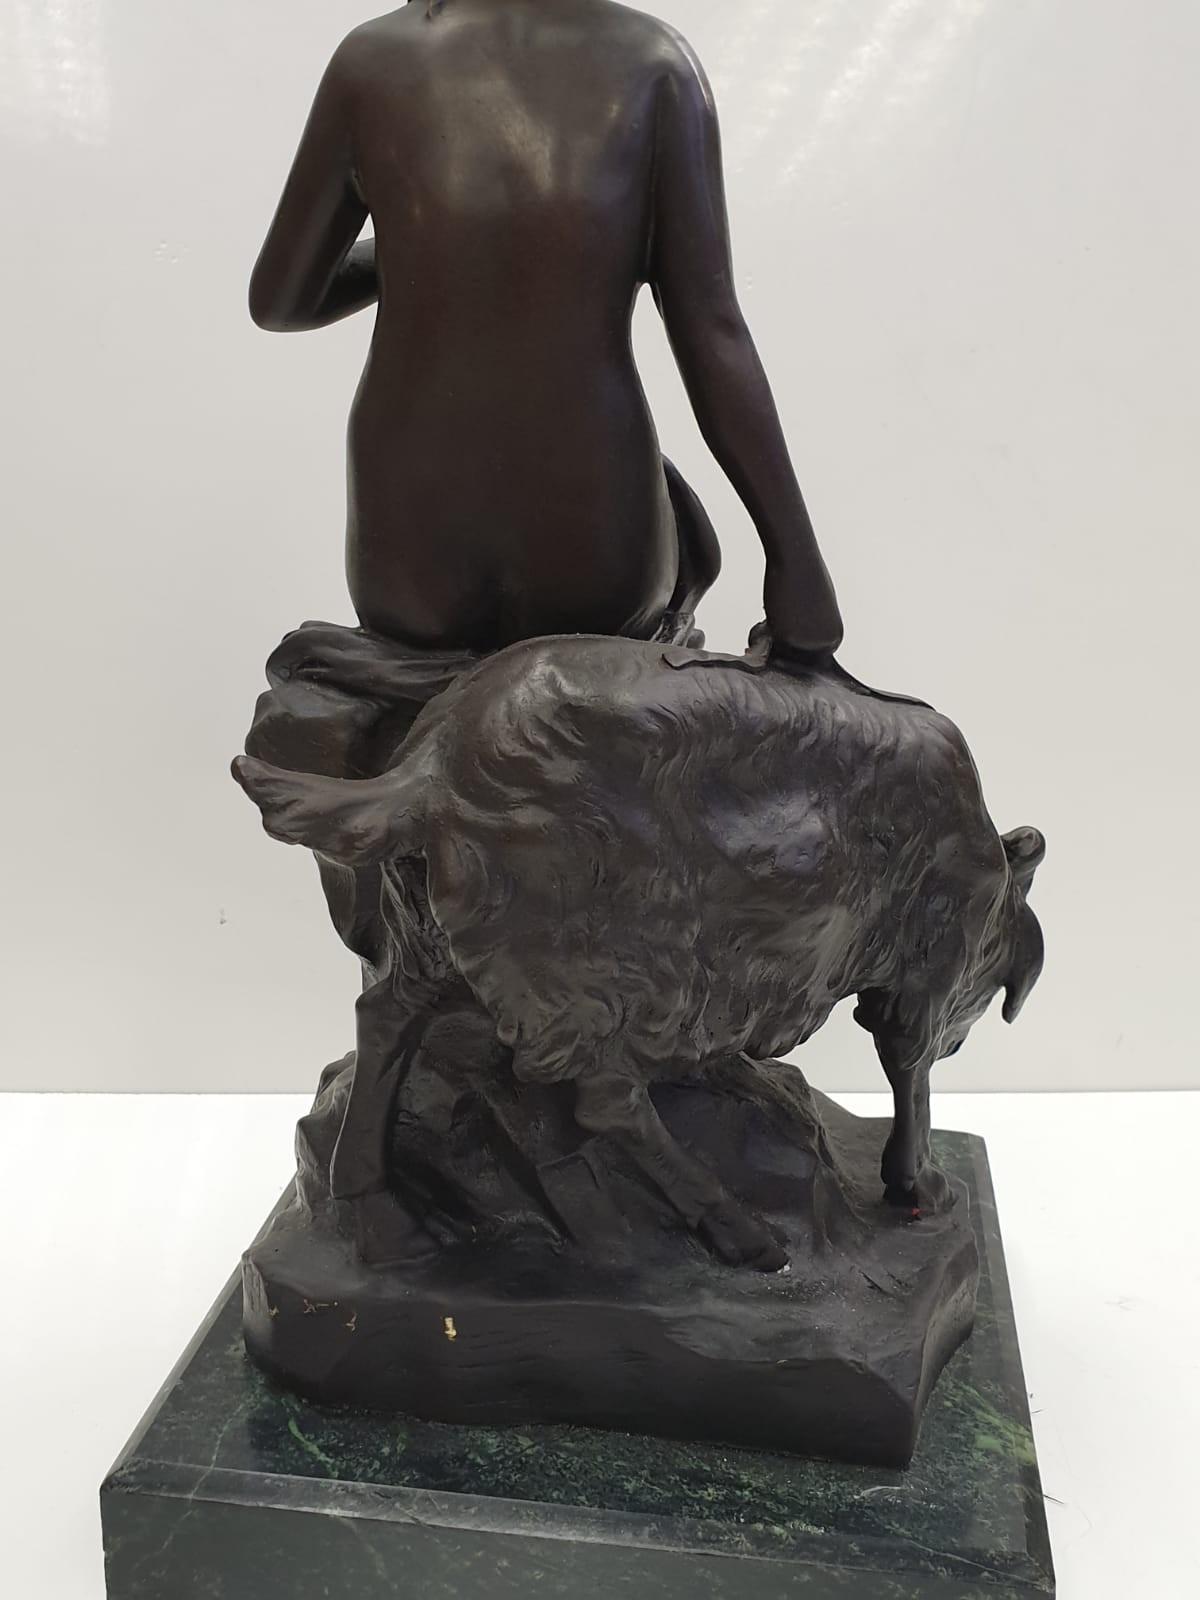 Bronze Pierre Julien figurine on plinth. 'Amalthea and Jupiter's Goat'. Height 45cm. Weight 9.7kg - Image 14 of 27